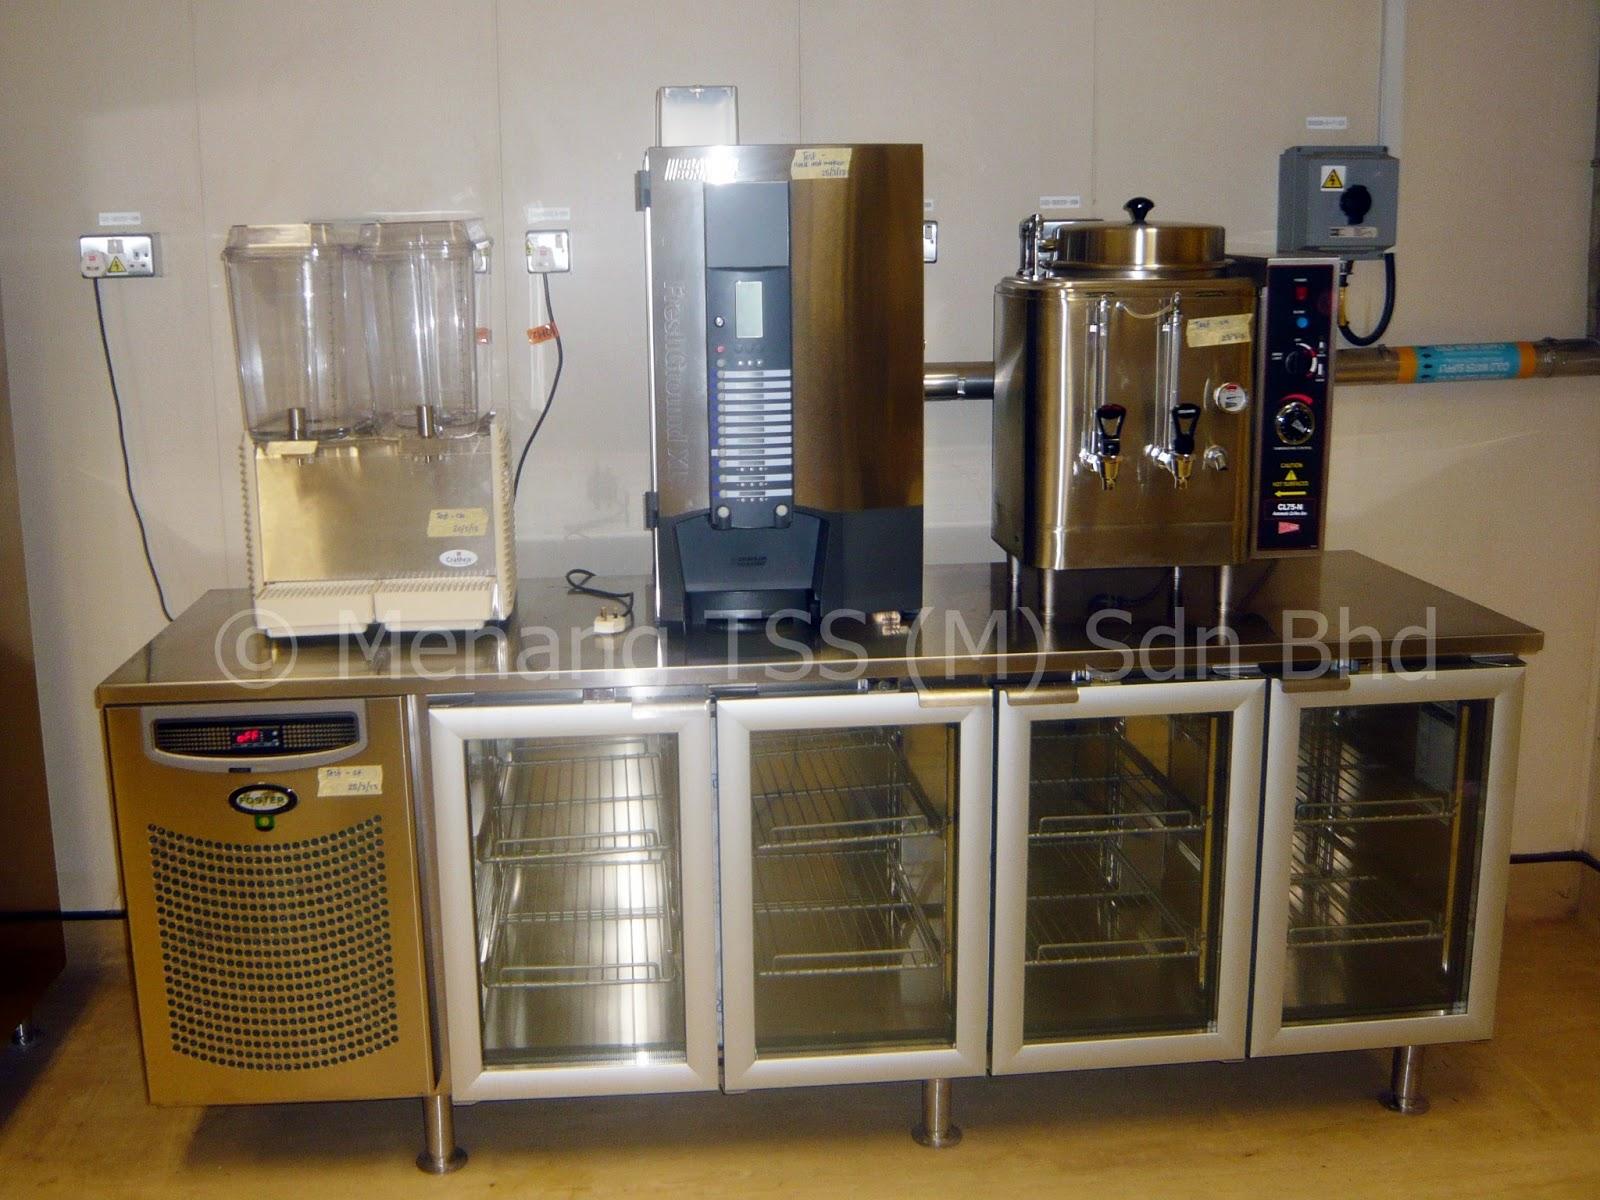 Commercial Kitchen Appliances  Menang TSS M Sdn Bhd